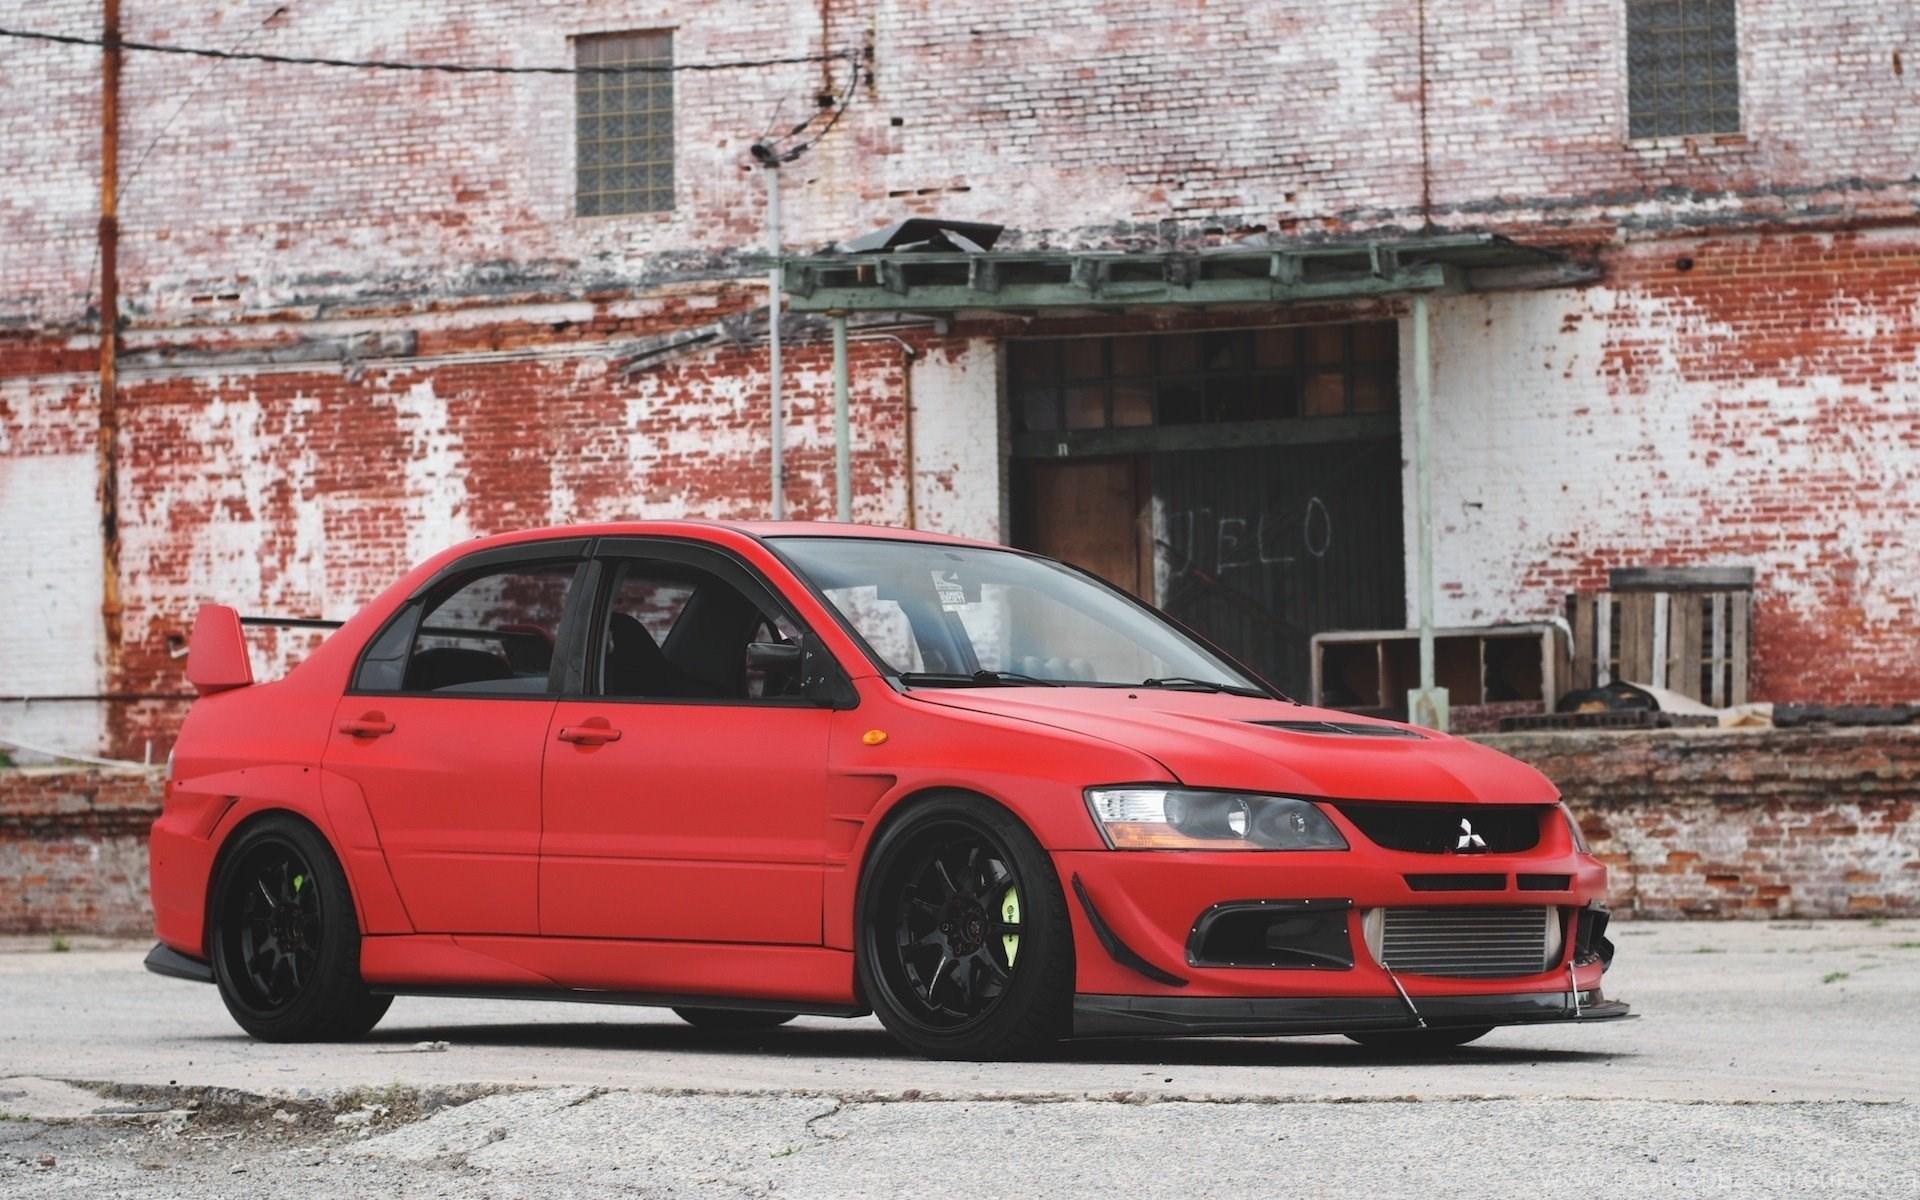 Mitsubishi Lancer Evolution X >> Download Wallpapers Mitsubishi, Lancer, Evolution 9, Jdm ...